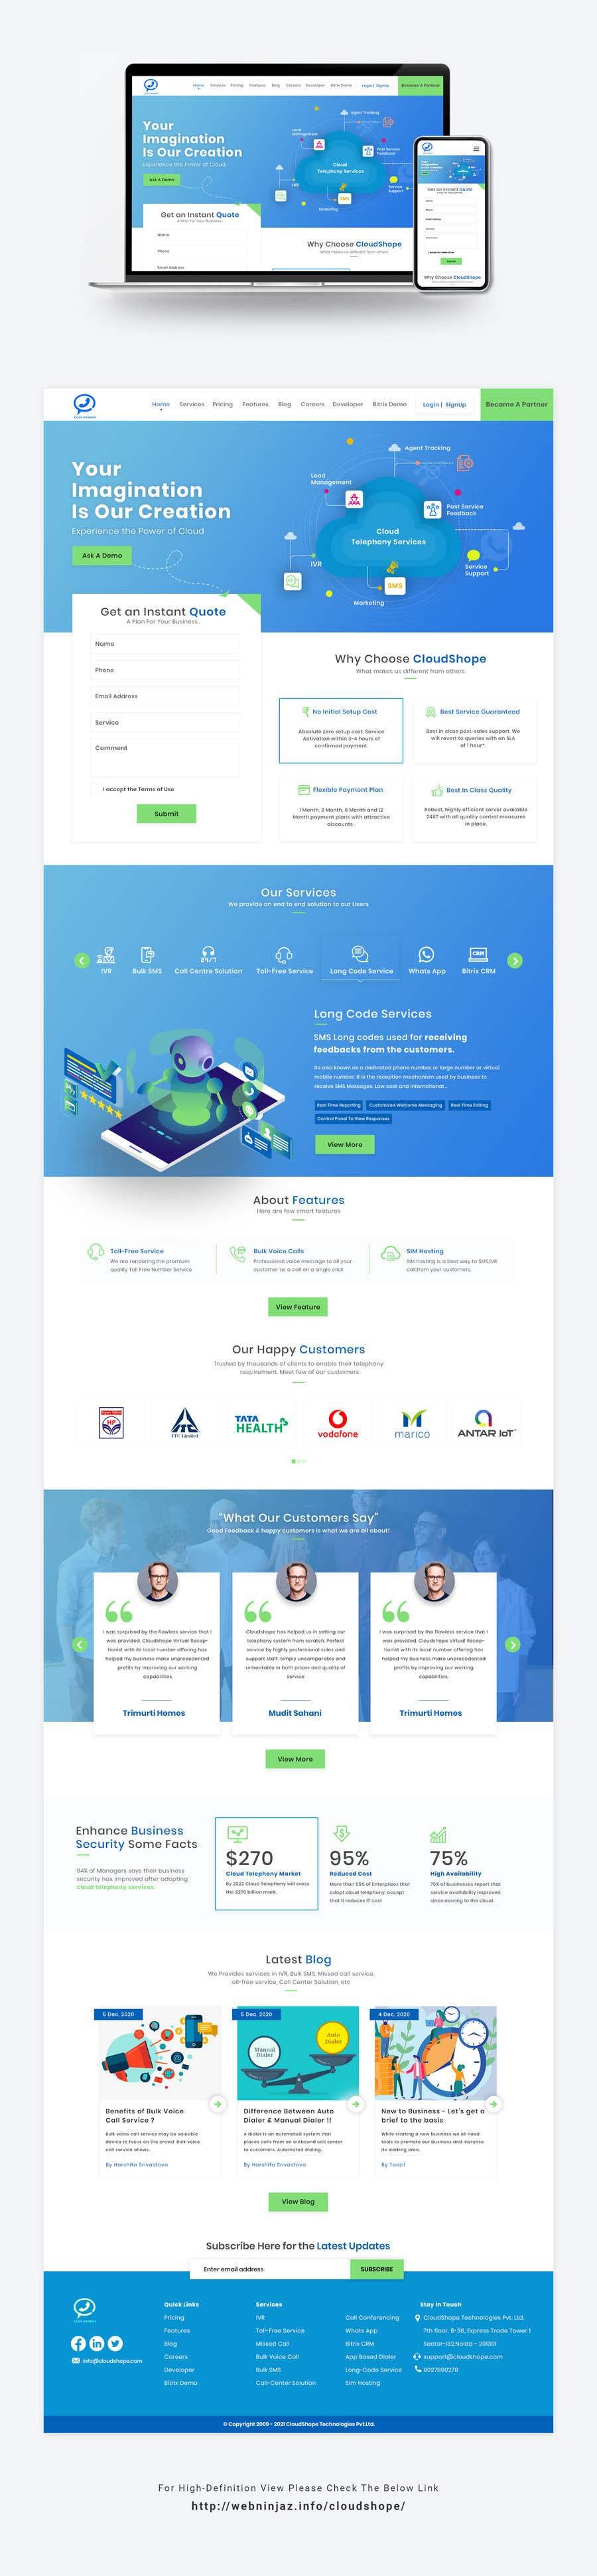 Konkurrenceindlæg #                                        16                                      for                                         Build Excellent Front Page Of our website - 14/05/2021 12:47 EDT